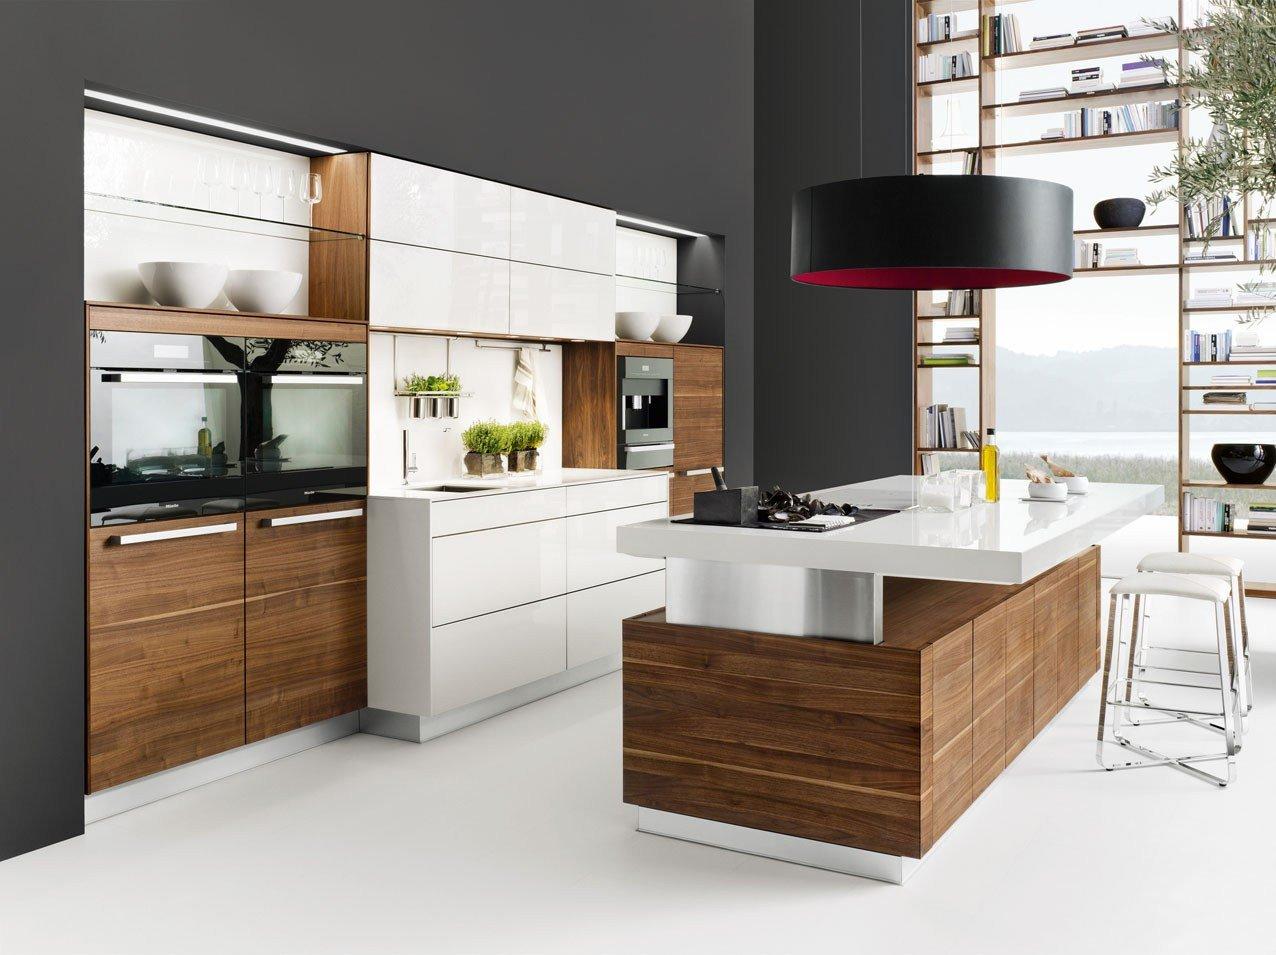 team 7 presenta le cucine k7, linee, loft - Cucine Loft